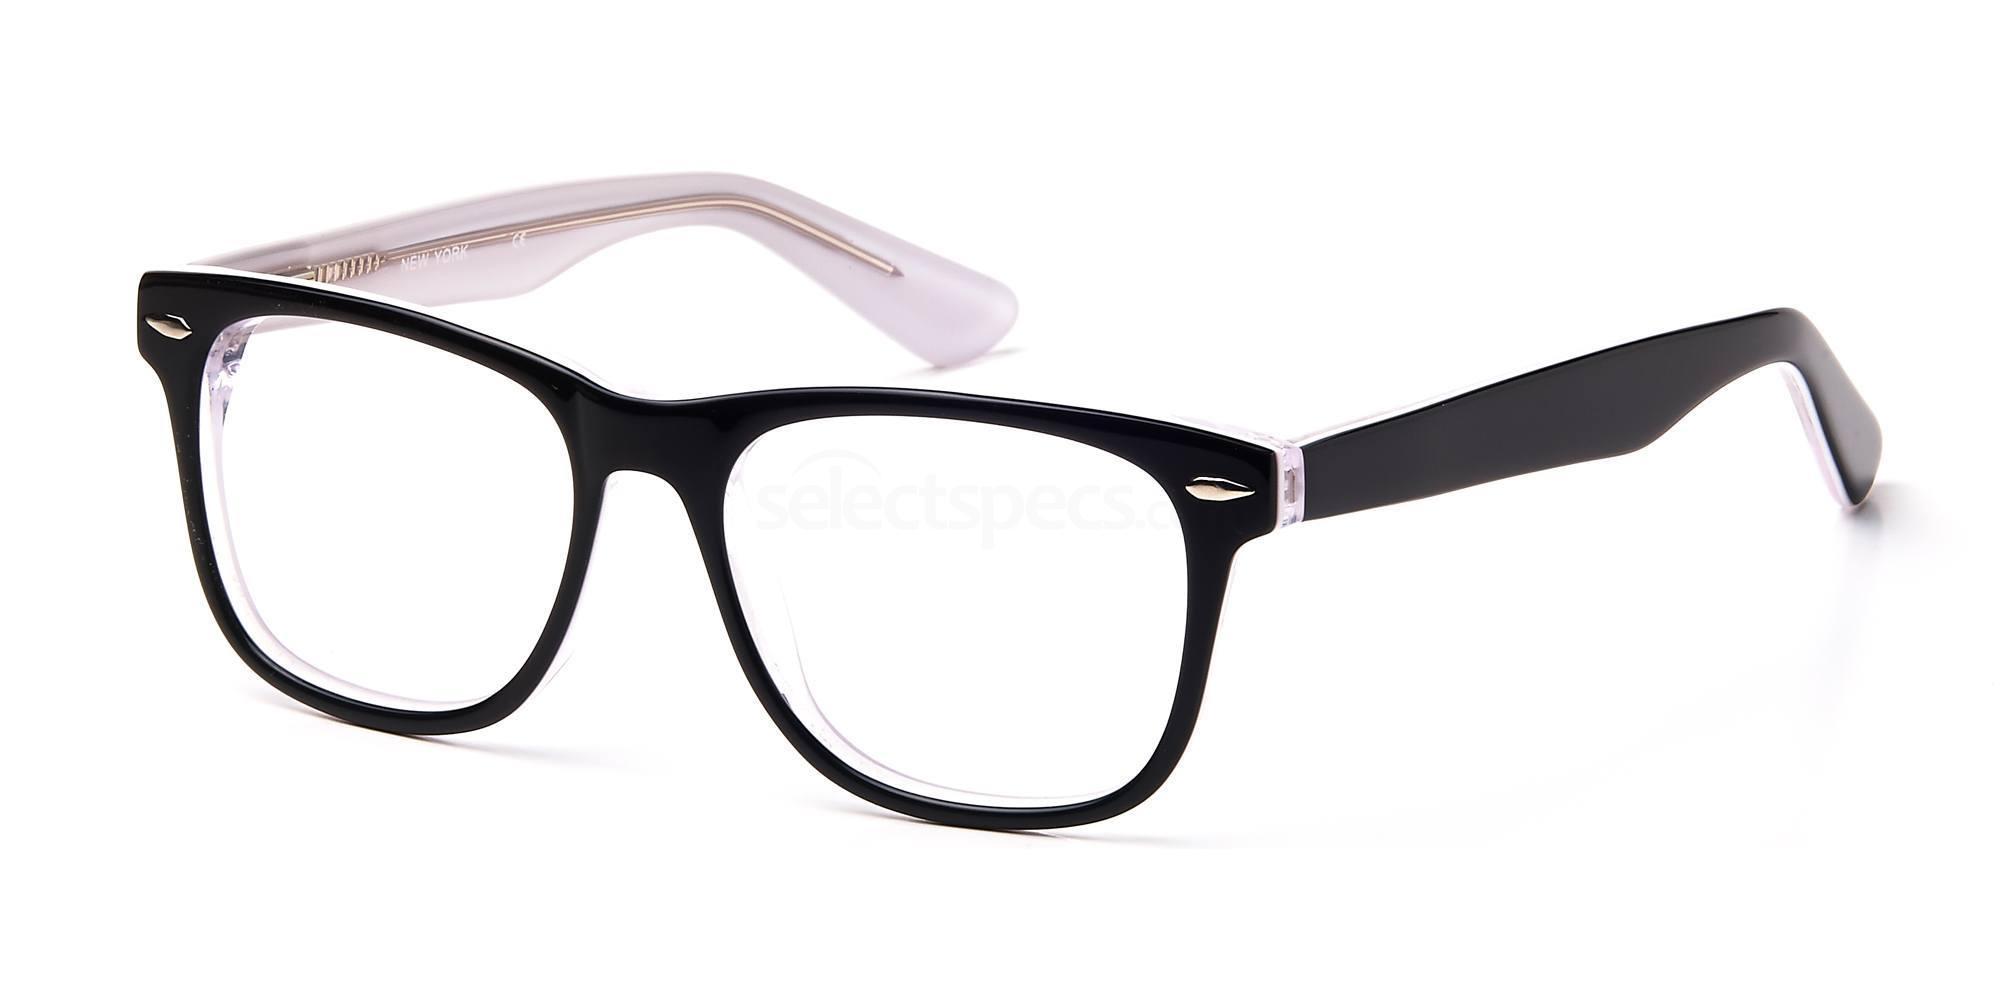 C1 NEWYORK Glasses, Top Secret KIDS